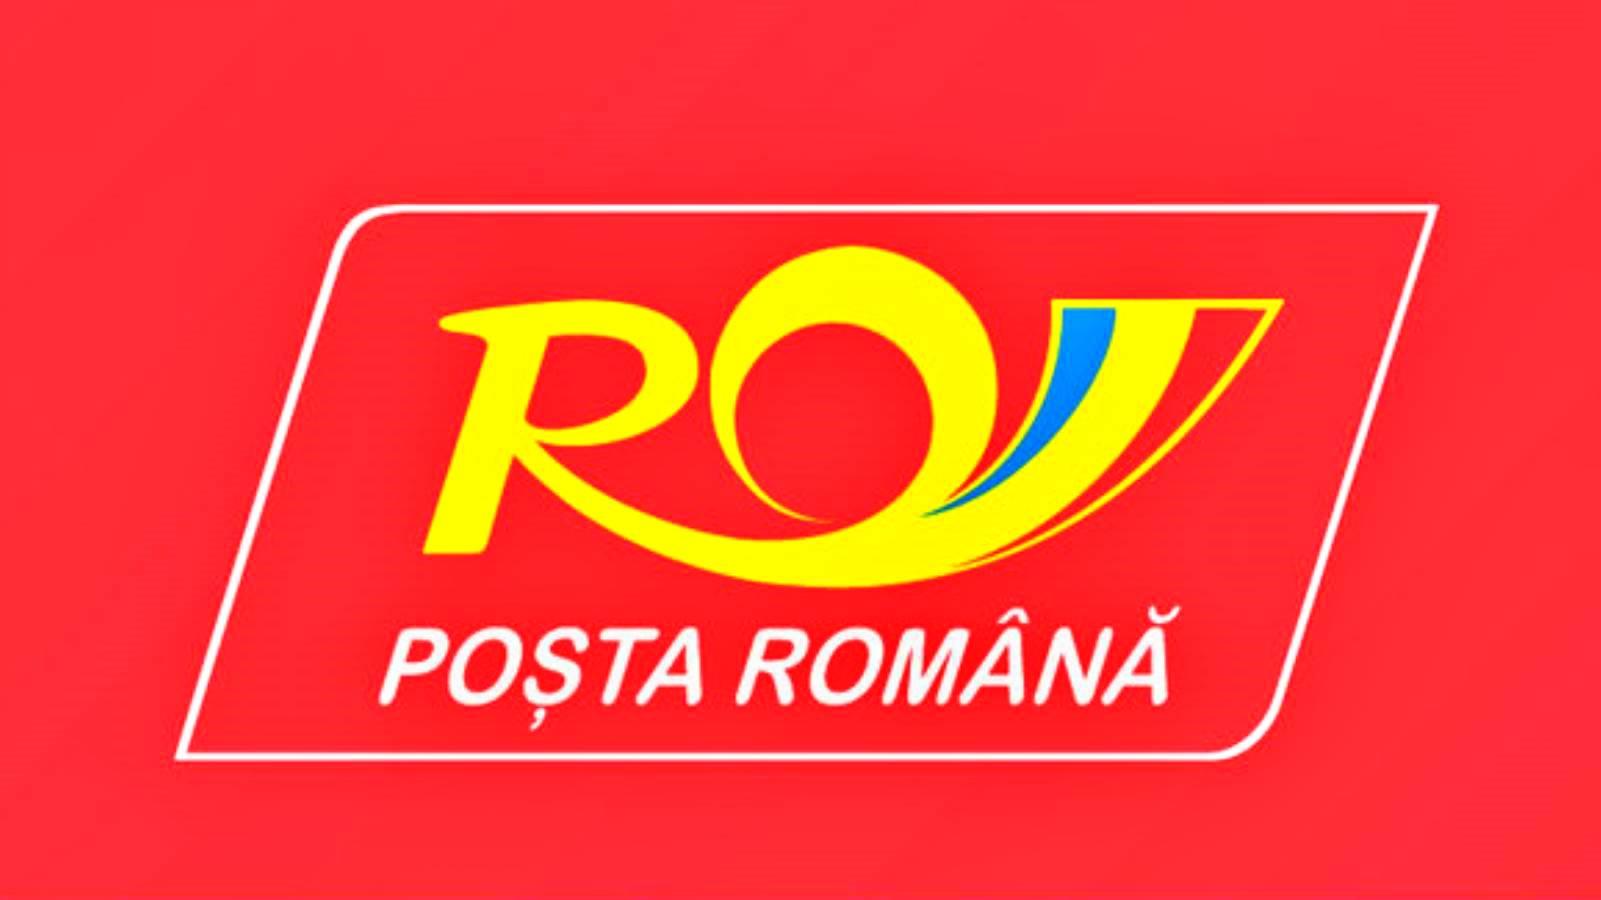 Posta Romana Anuntul privind Preturile Prioripost in Romania